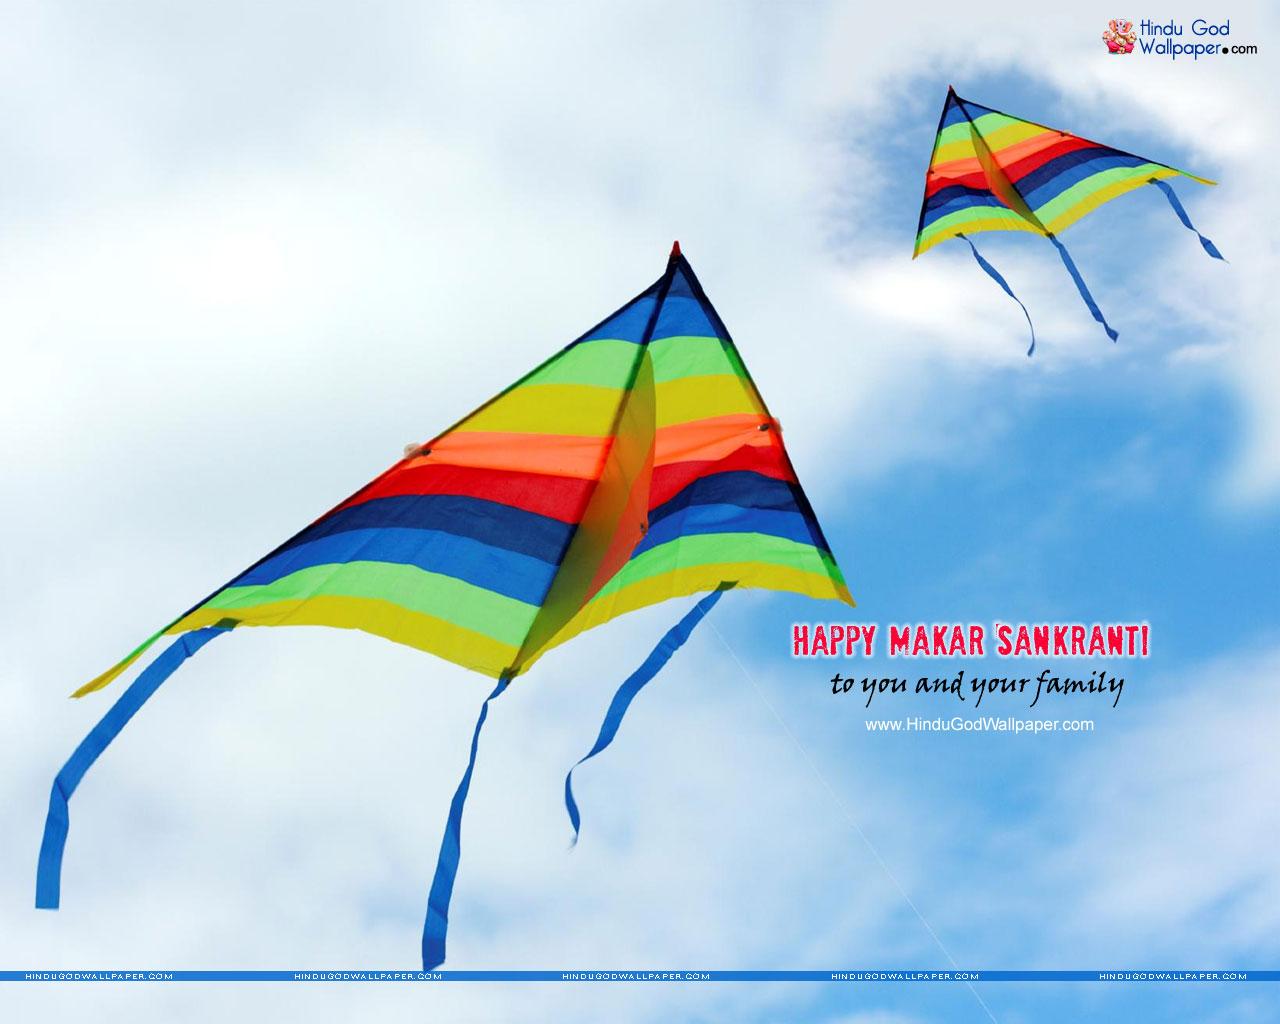 Makar Sankranti Kites Wallpaper